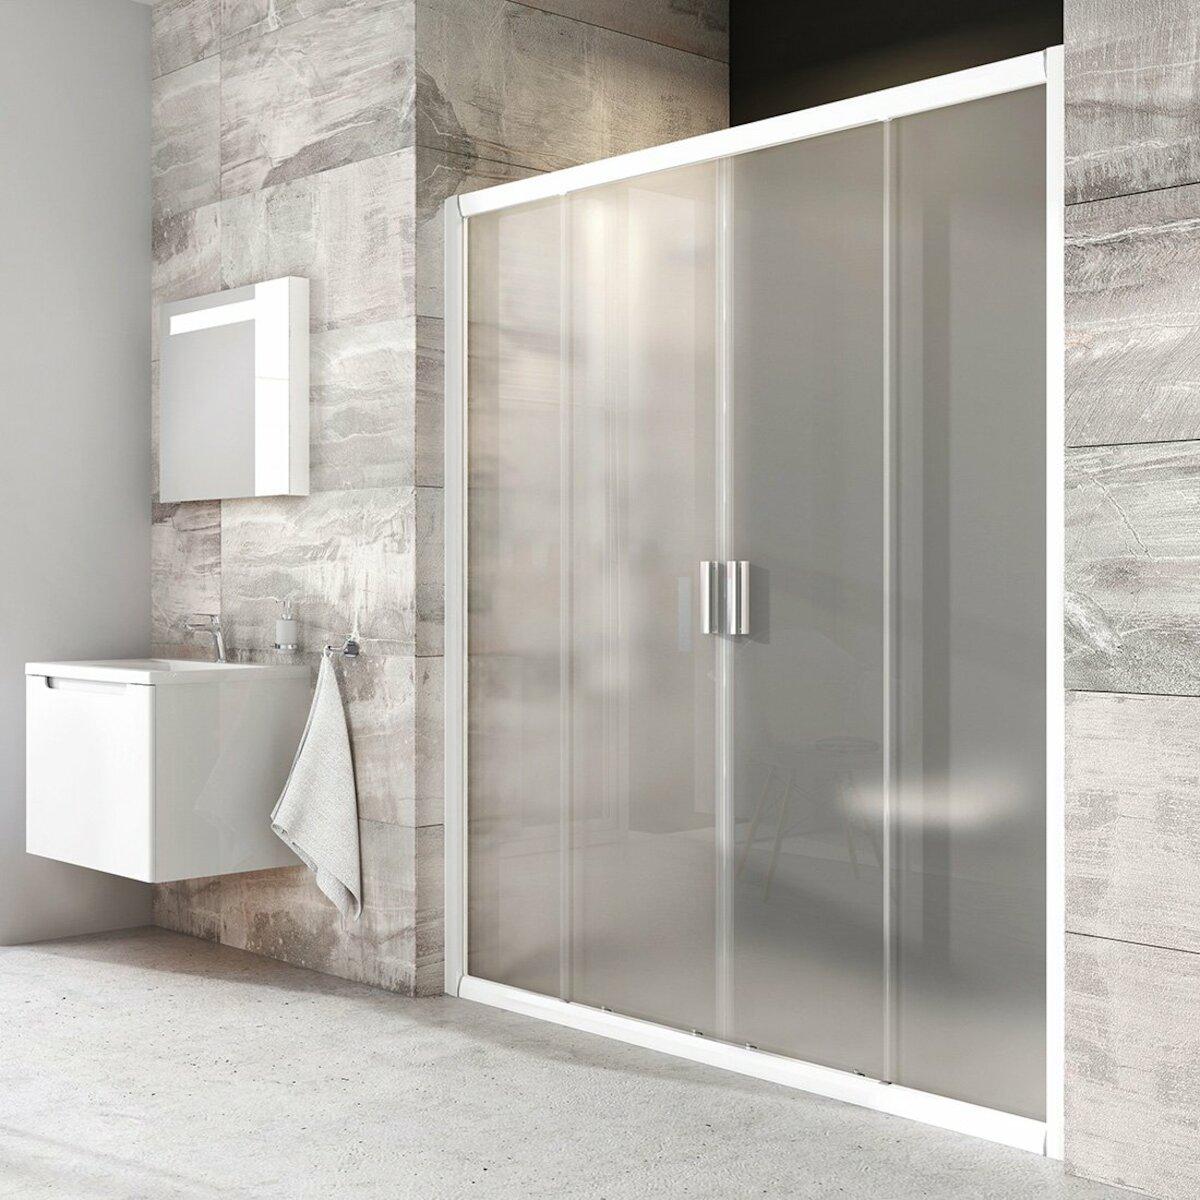 Sprchové dvere 140x190 cm Ravak Blix biela 0YVM0100ZG